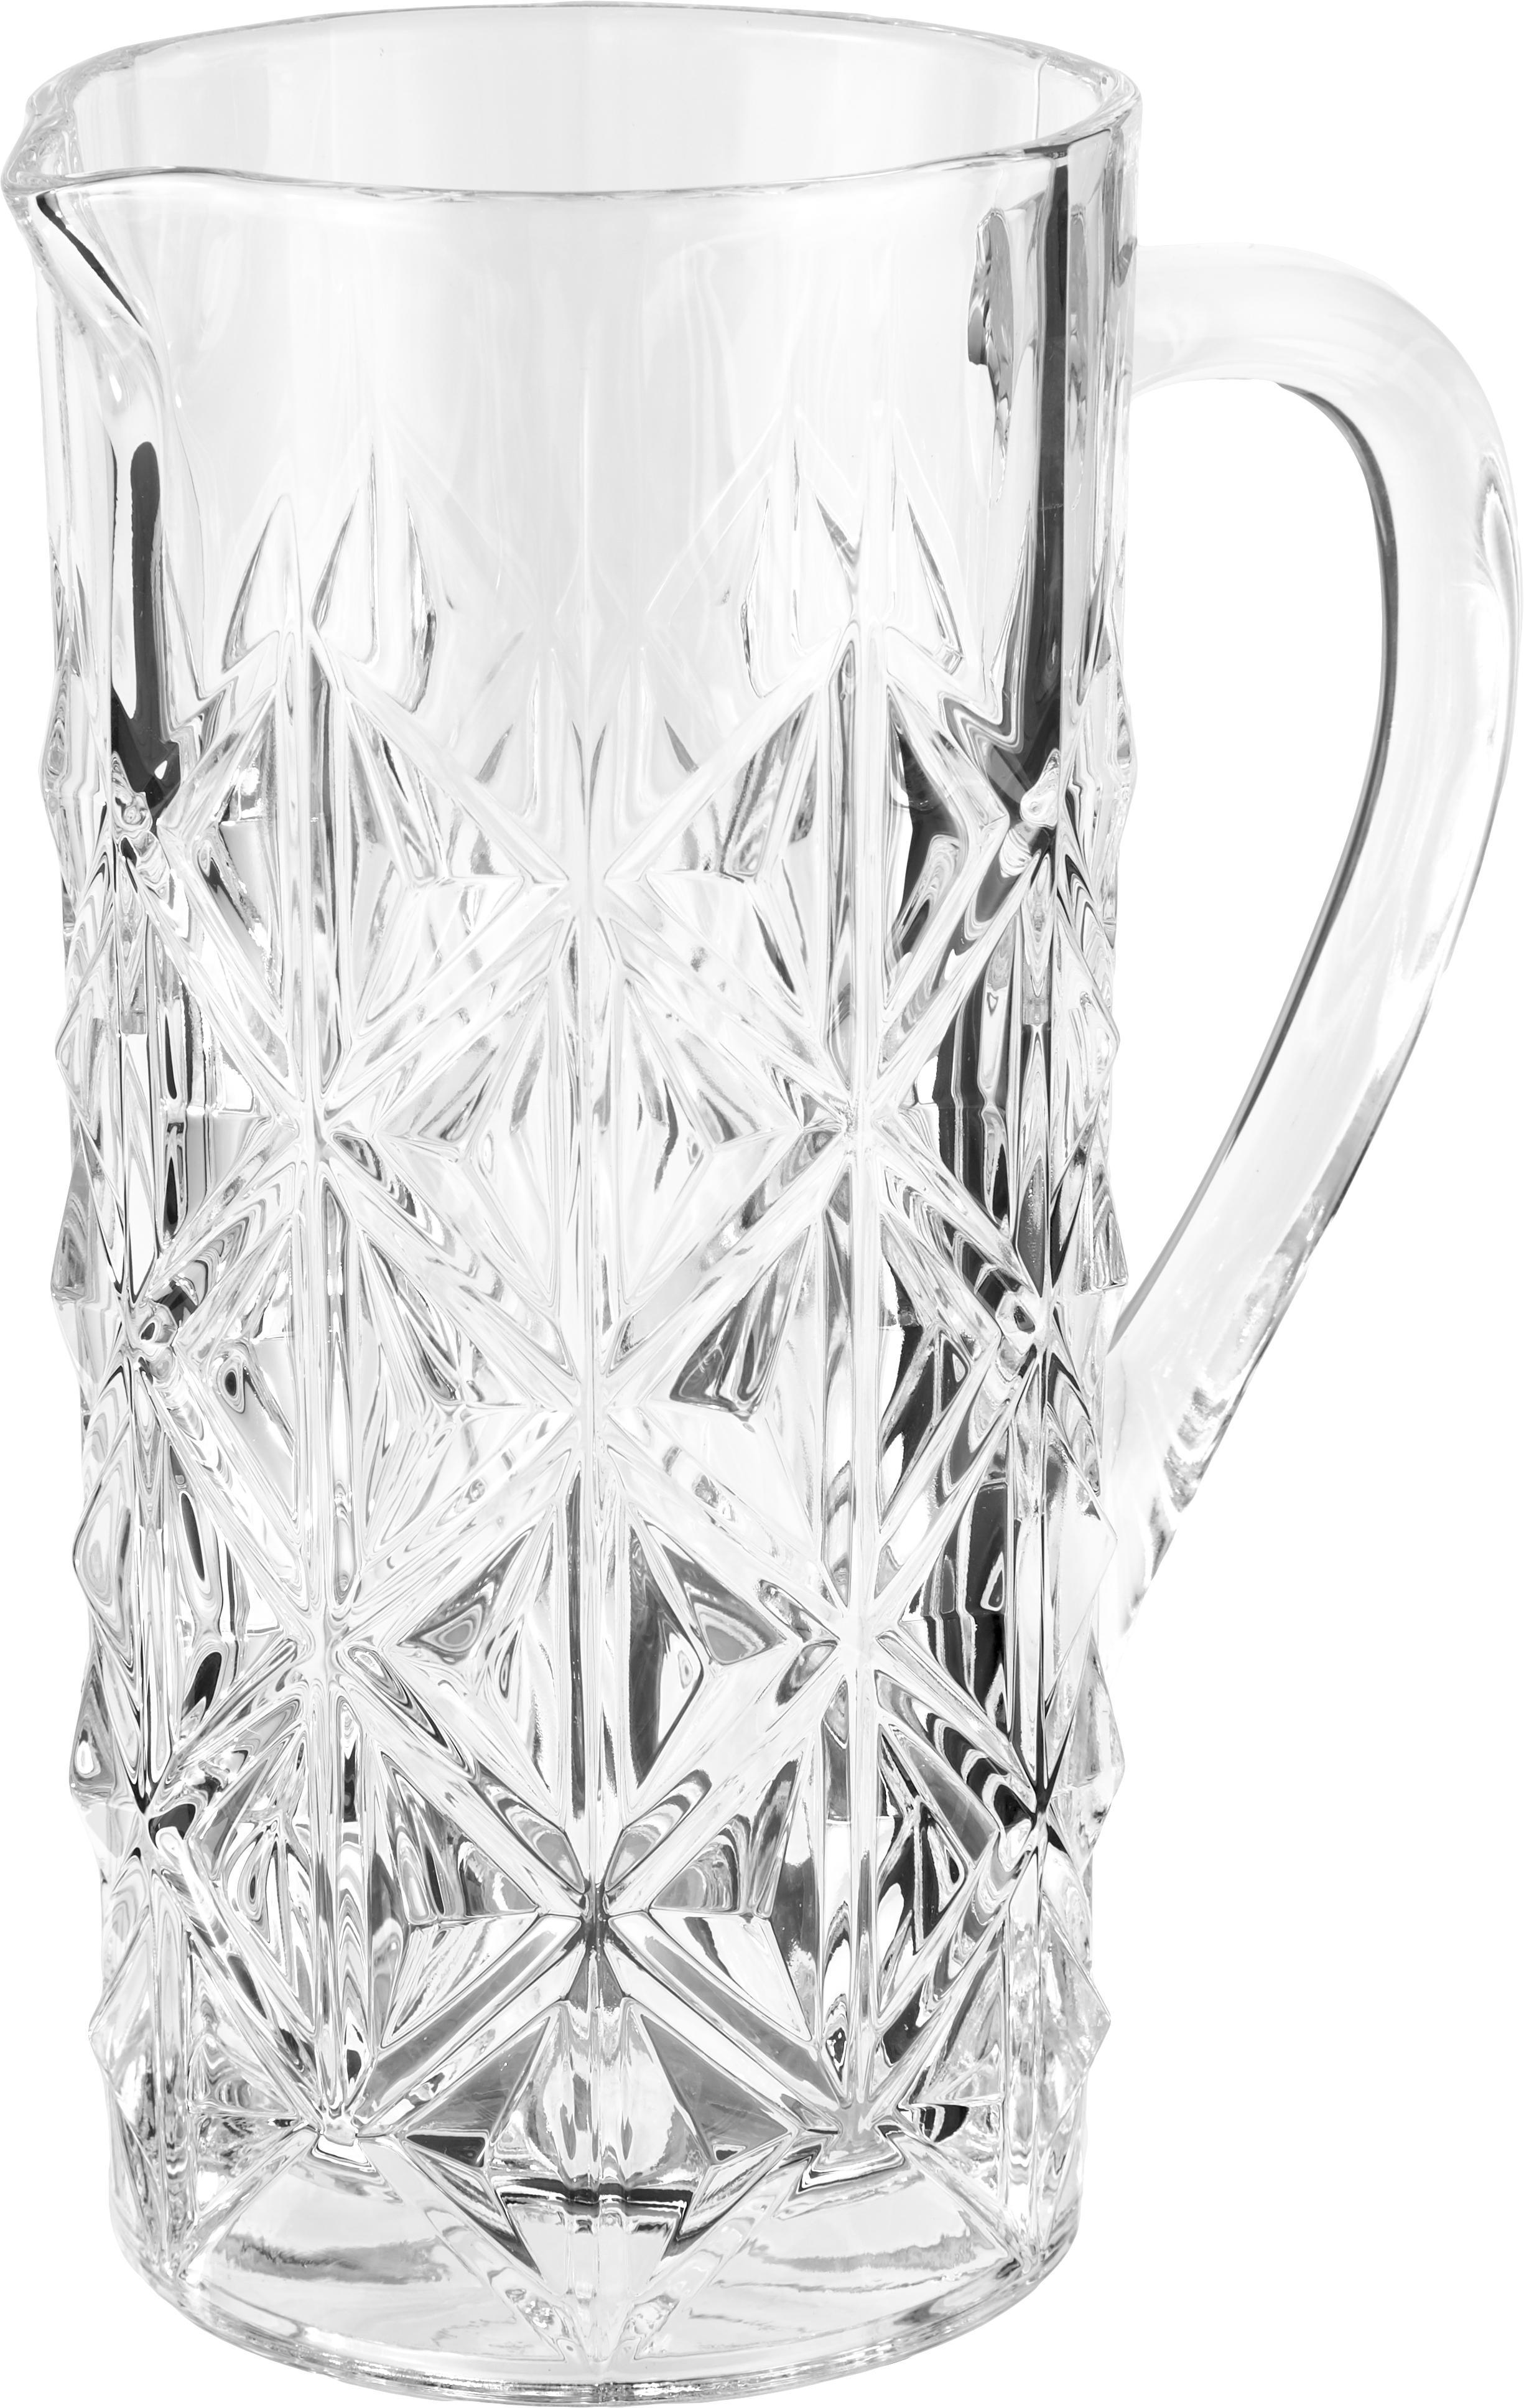 Kristall-Krug Enigma, Luxion-Kristallglas, Transparent, 1.2 L